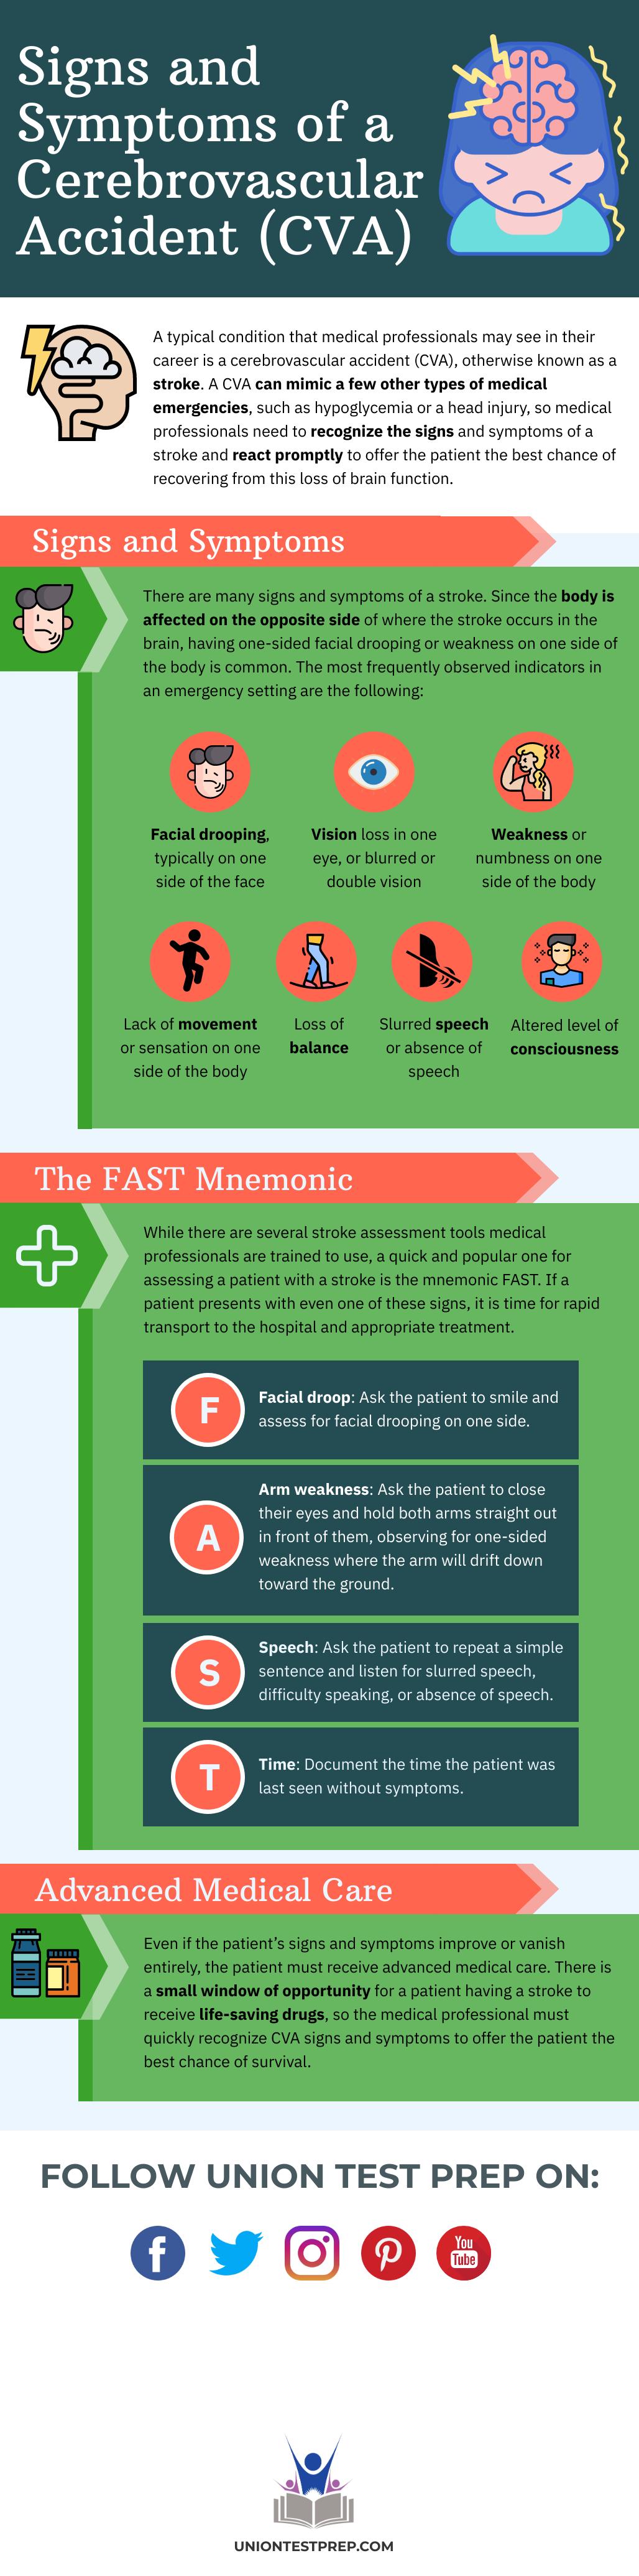 Signs and Symptoms of a Cerebrovascular Accident (CVA)